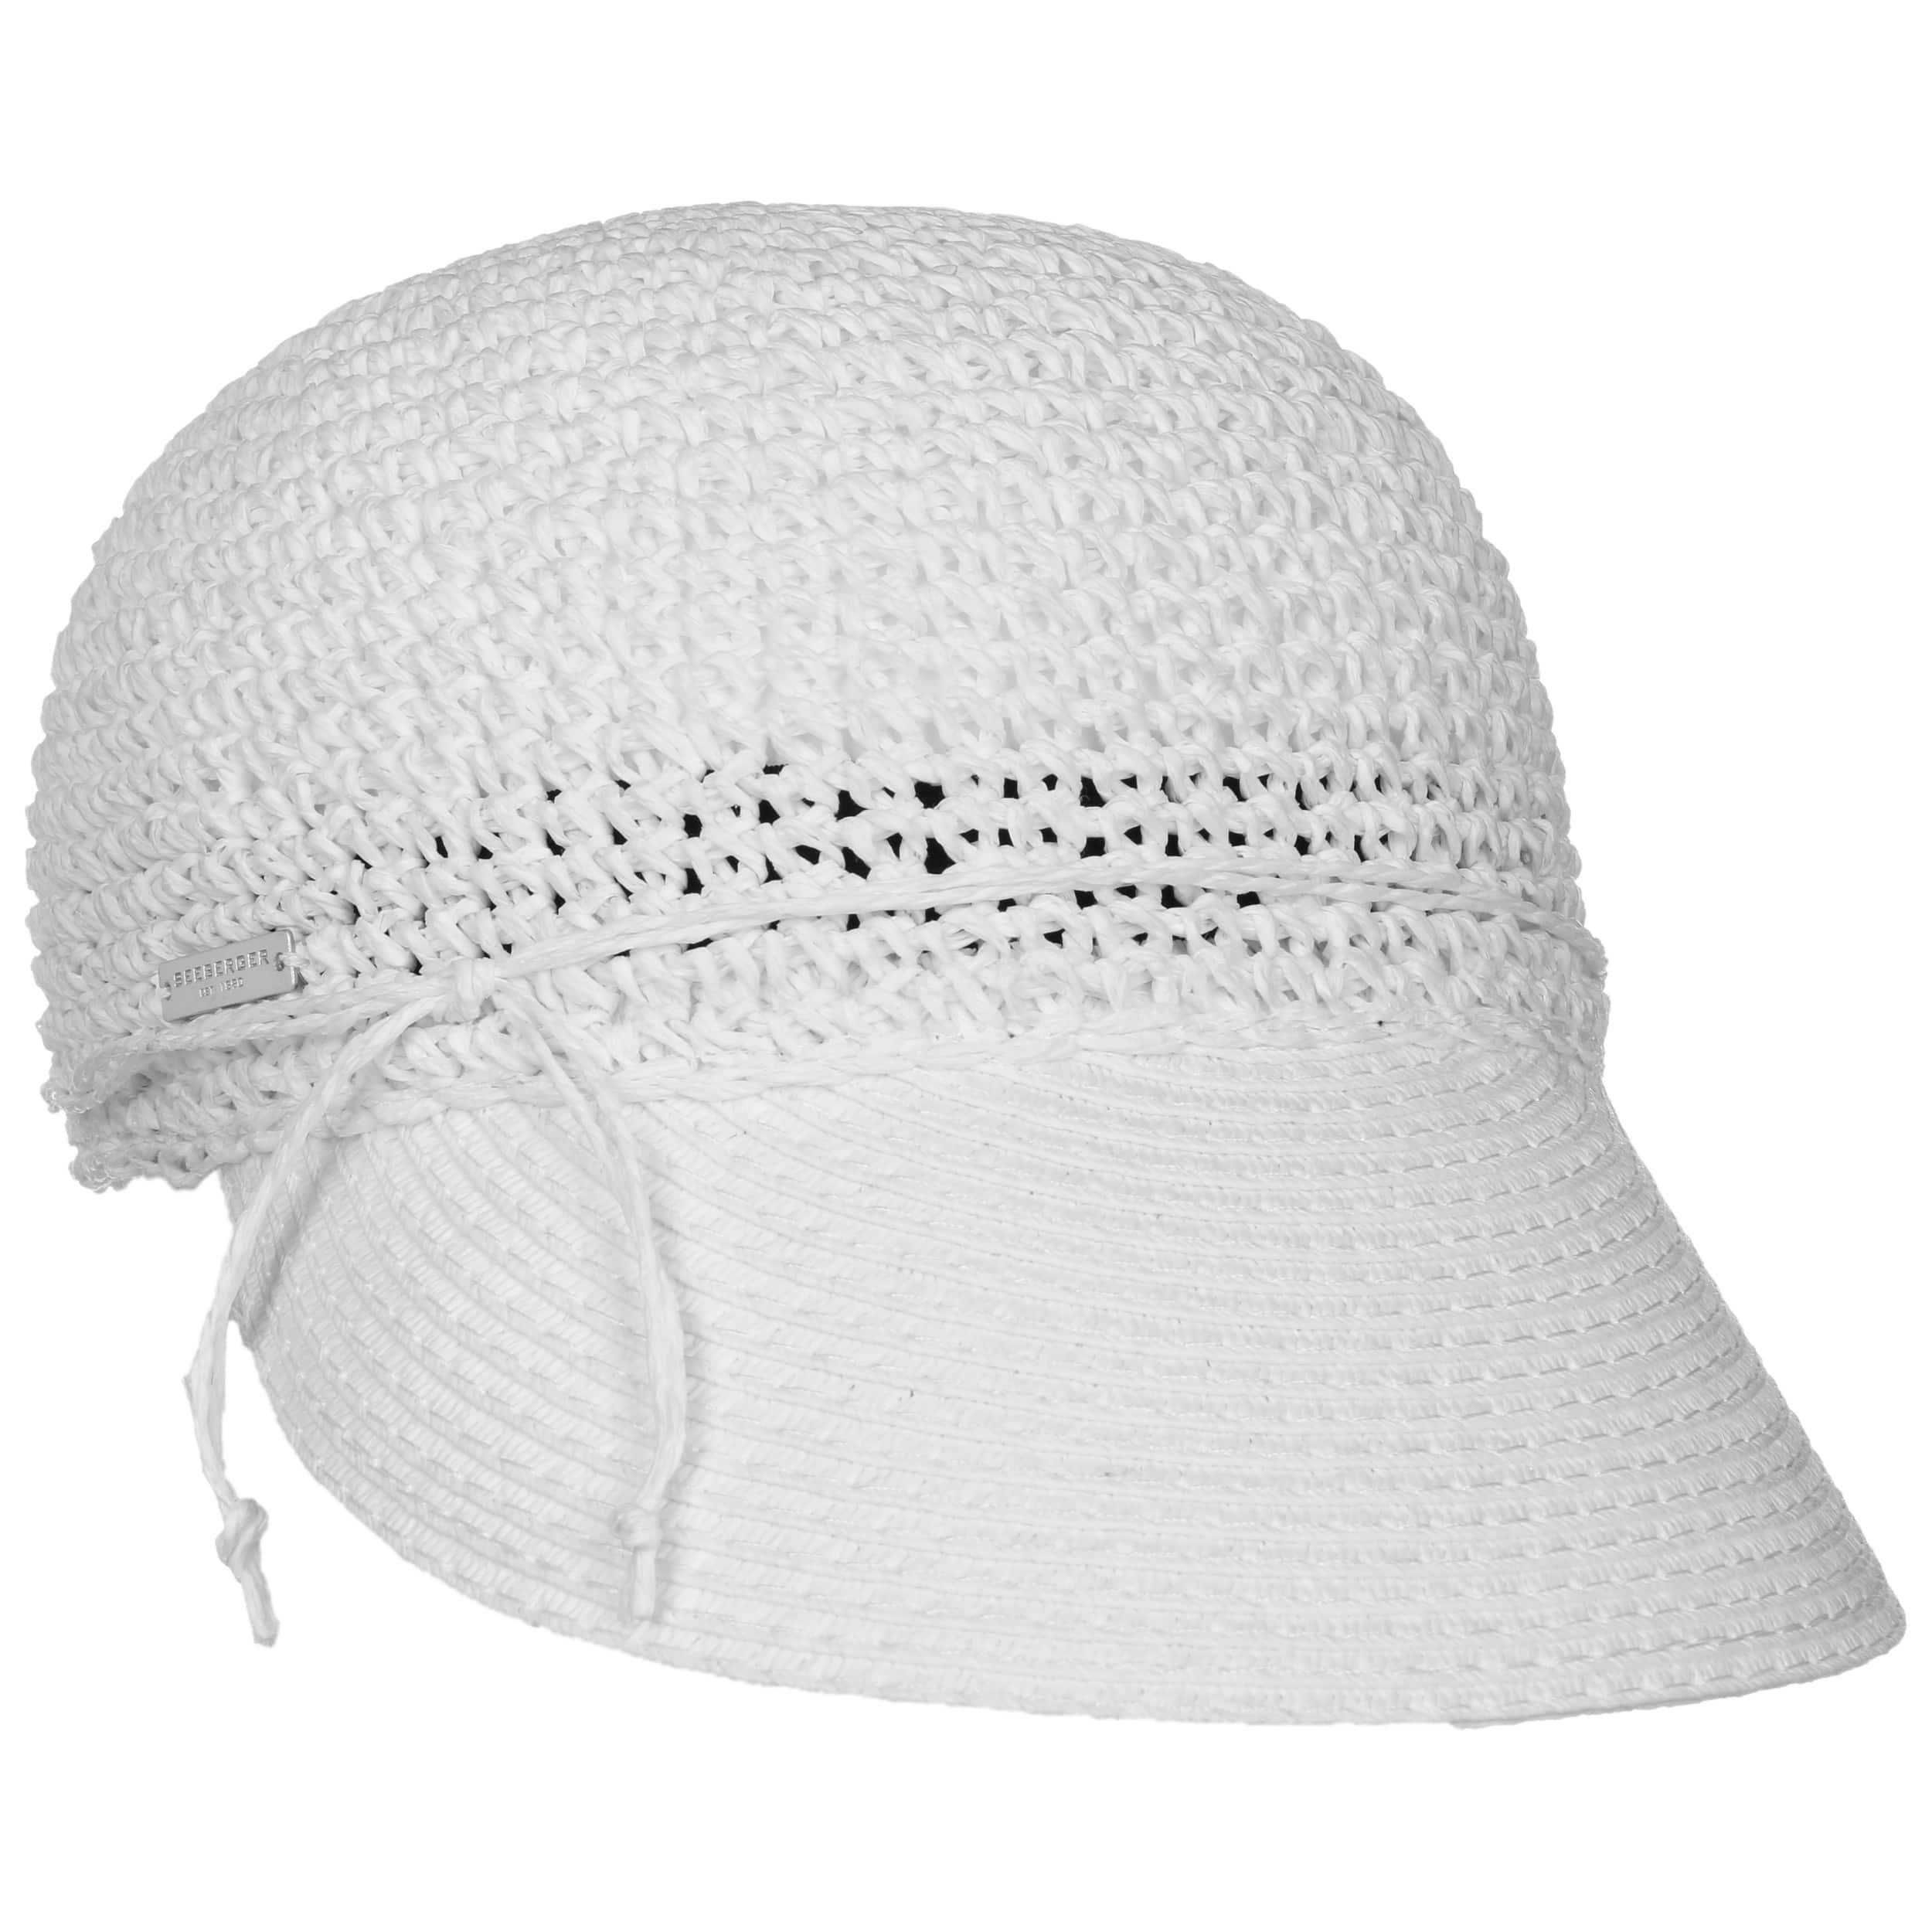 Uni Rollable Crochet Cap By Seeberger 32 95